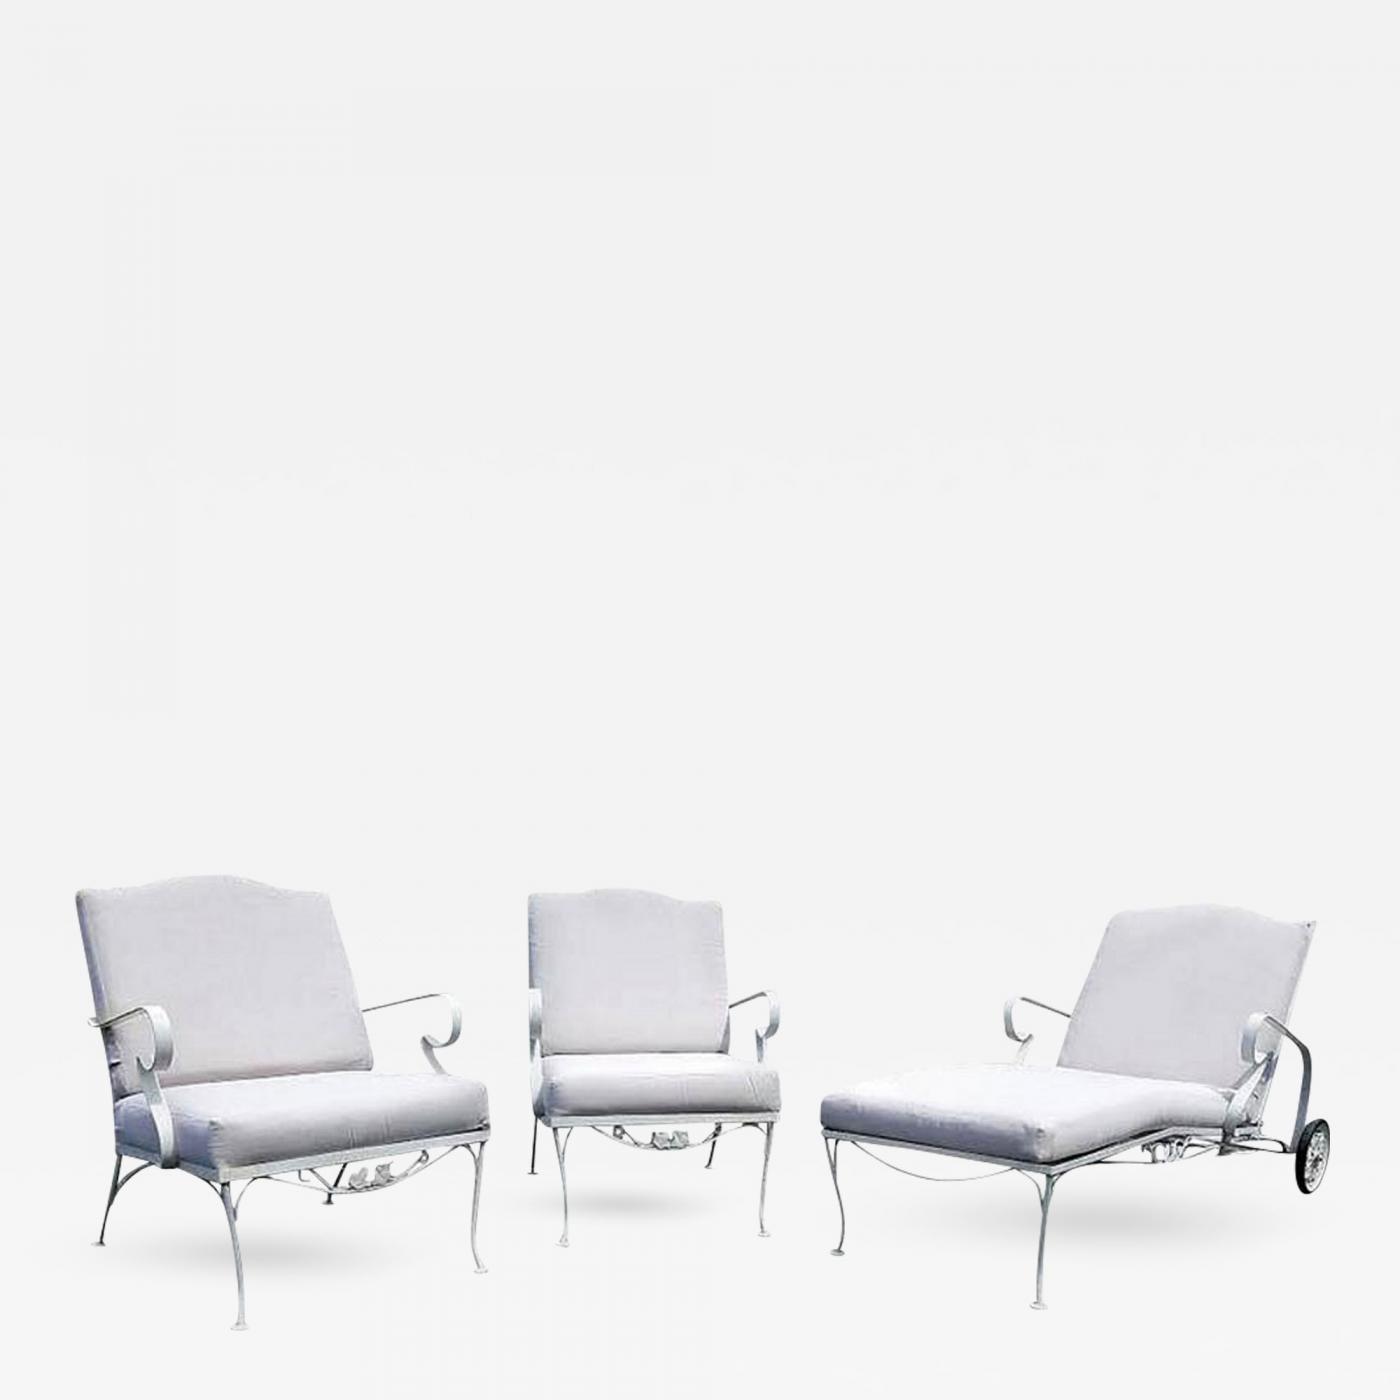 Pleasant Russell Woodard Woodard Furniture Vintage Three Piece Iron Patio Set By Russell Woodard Bralicious Painted Fabric Chair Ideas Braliciousco